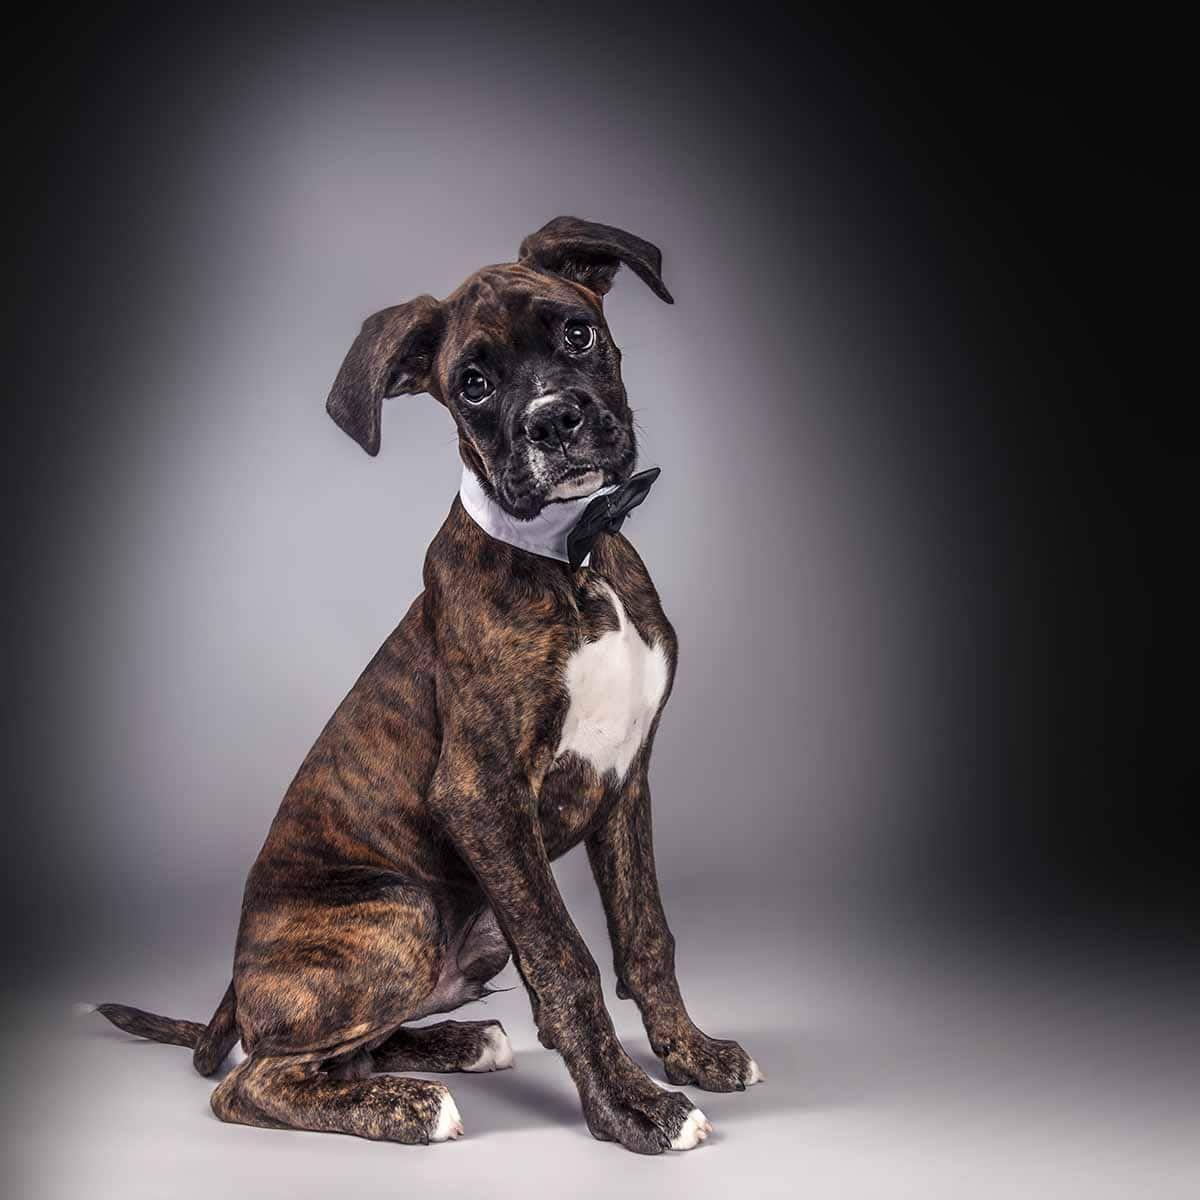 boxer dog in bow tie handsome smart studio portrait Dog